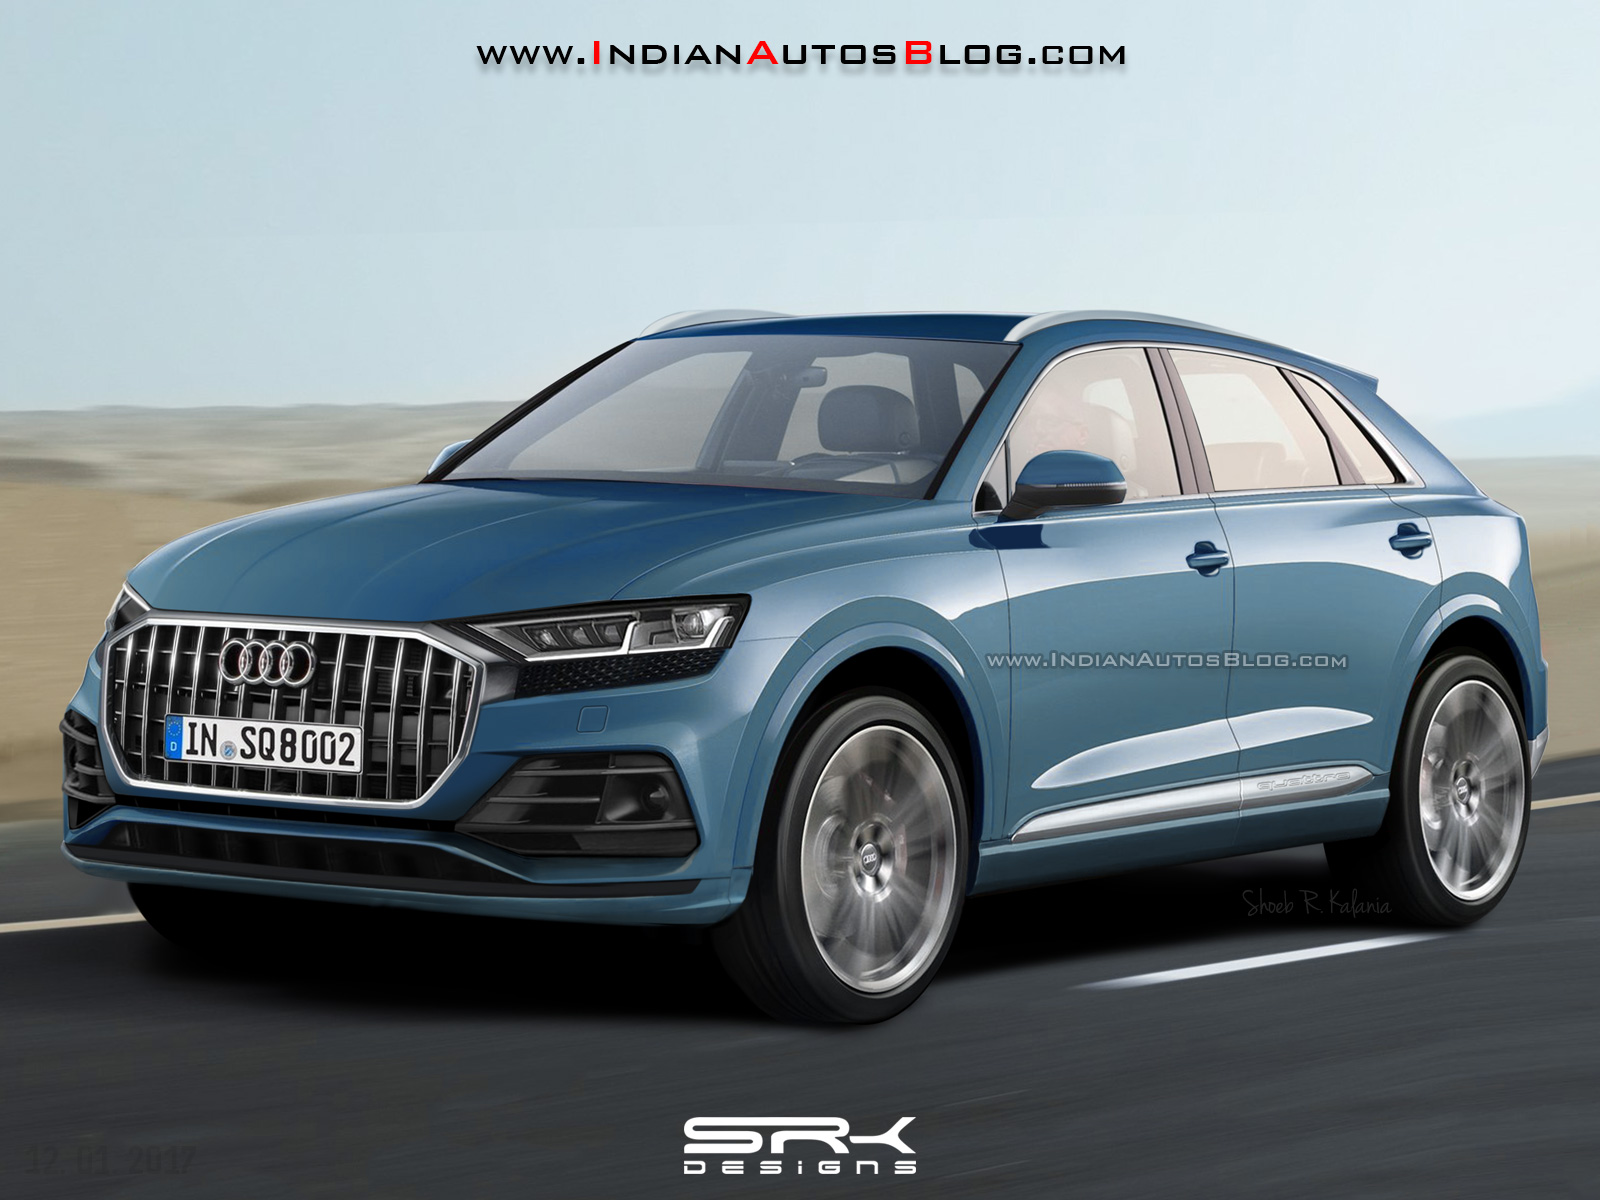 2018-Audi-Q8-rendering-front